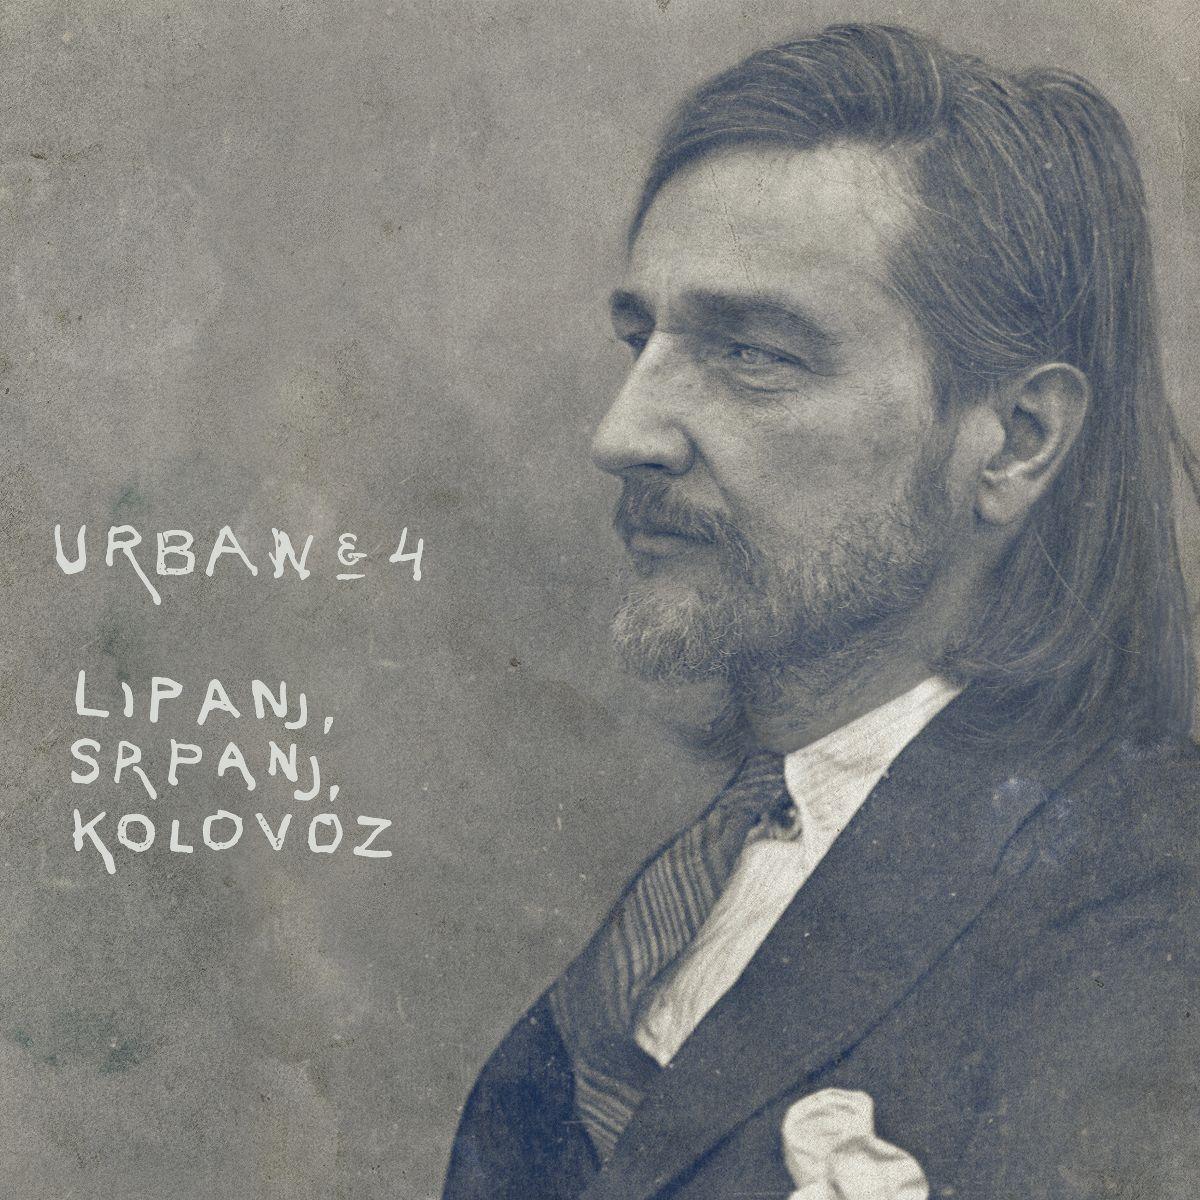 "CD preporuka: Urban&4 ""Lipanj, srpanj, kolovoz"""